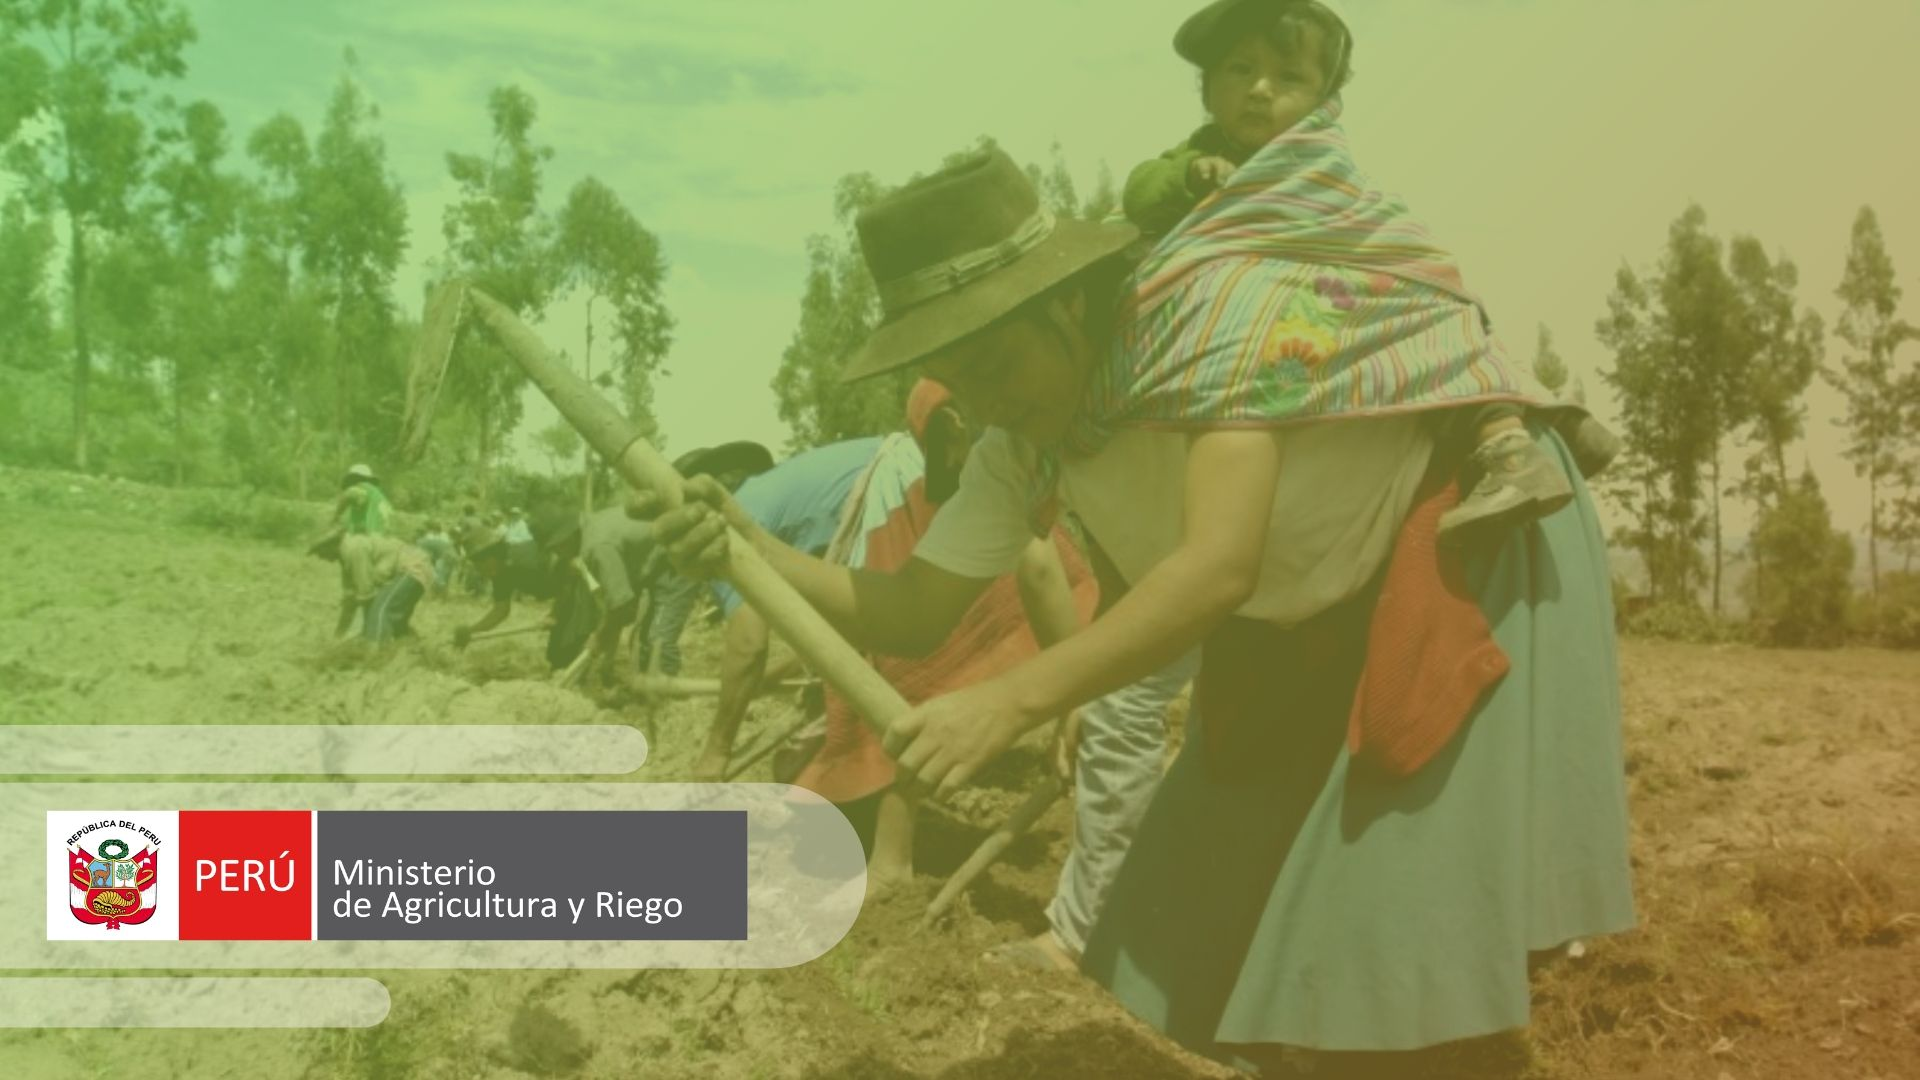 Qué es el MINAGRI Perú